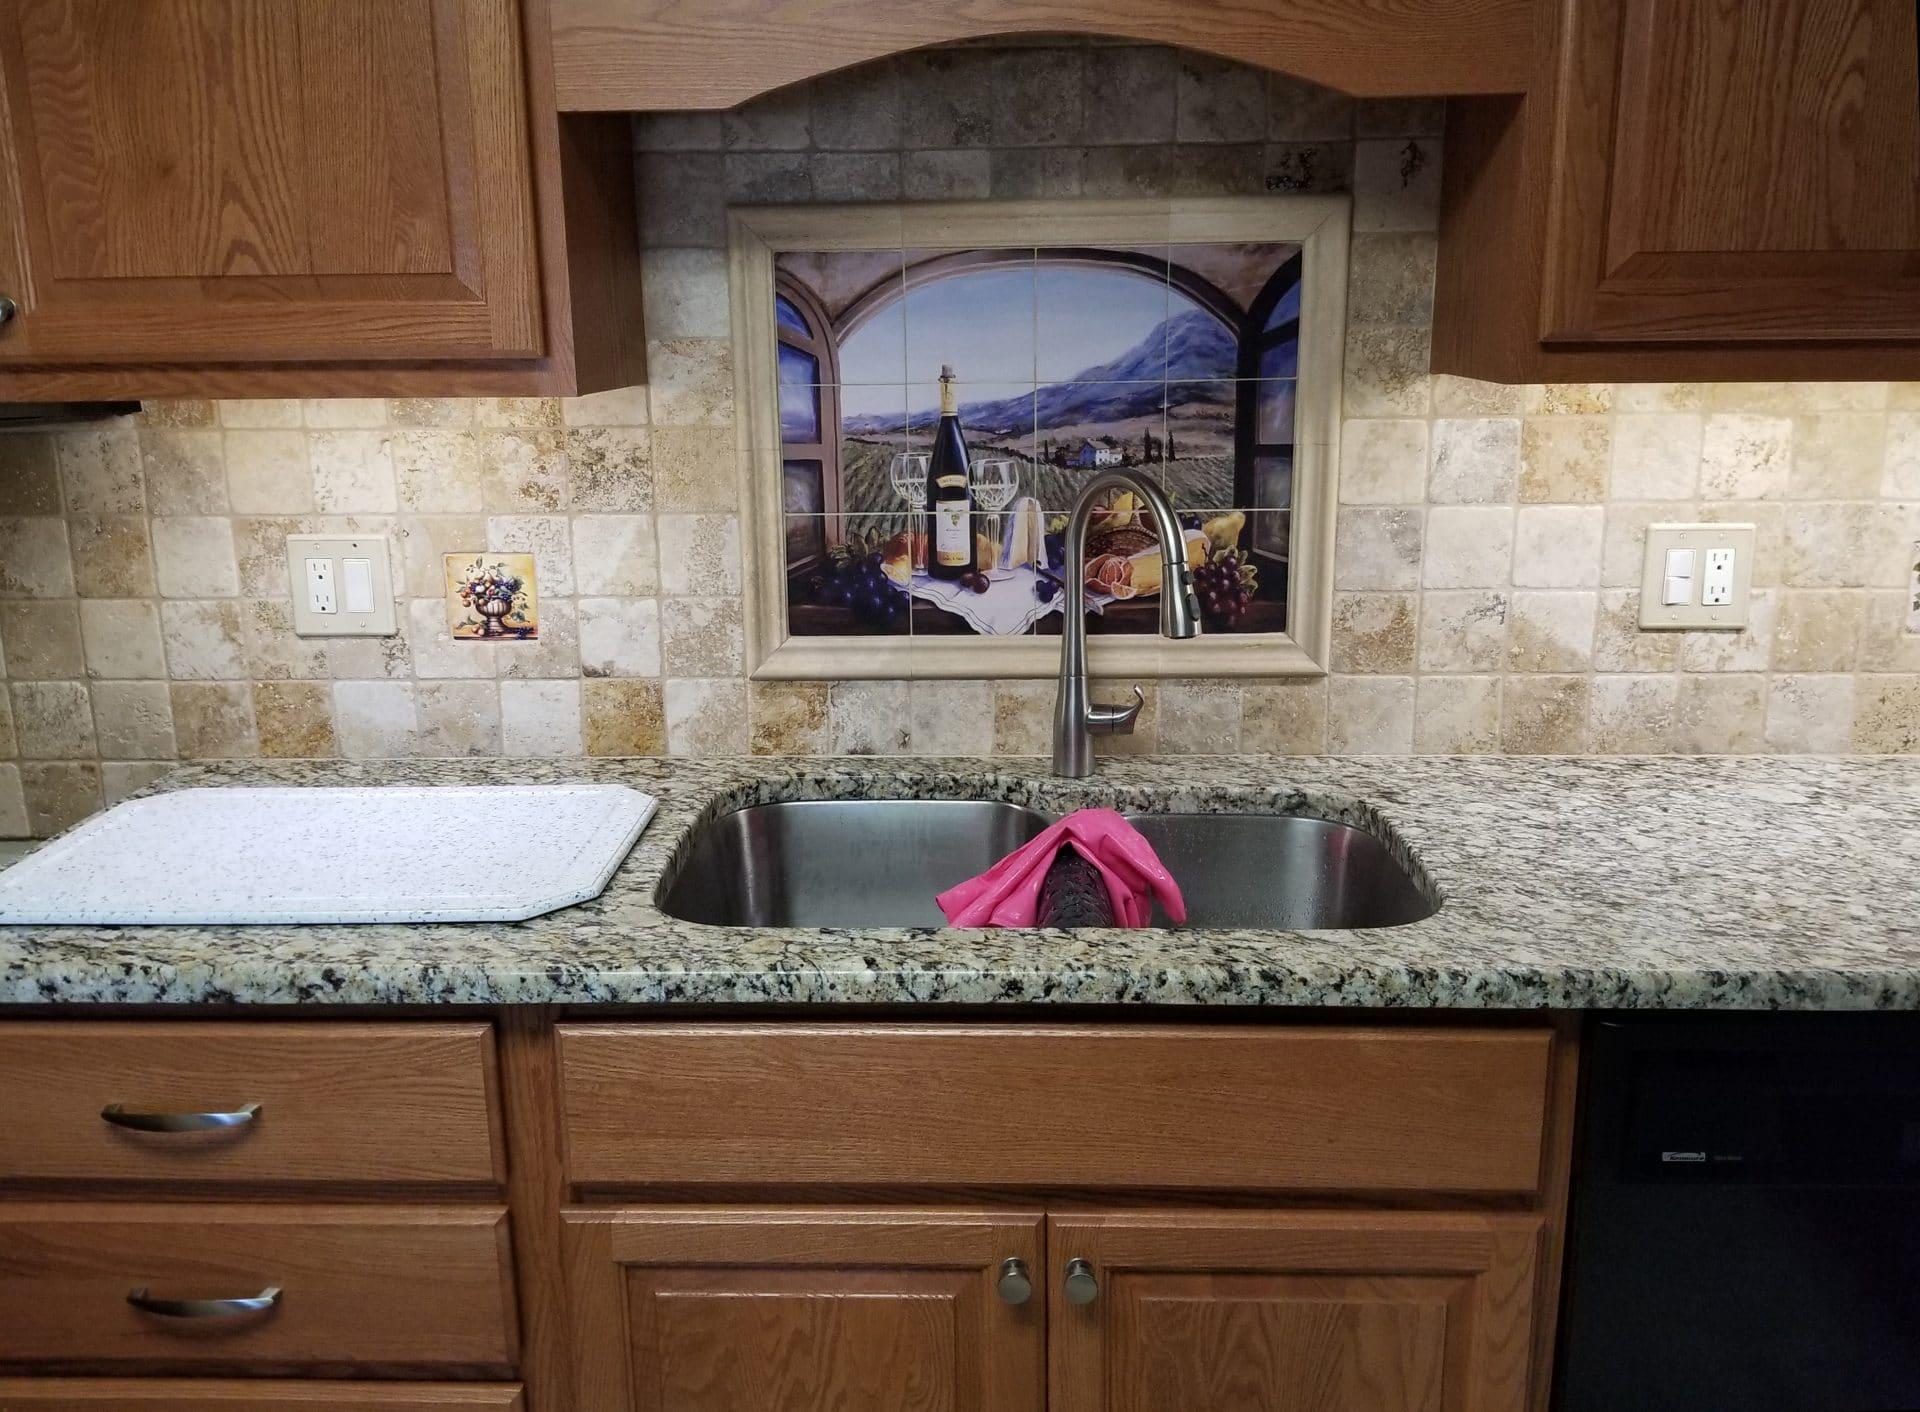 kenosha backsplash, custom tile kenosha, kitchen tile kenosha